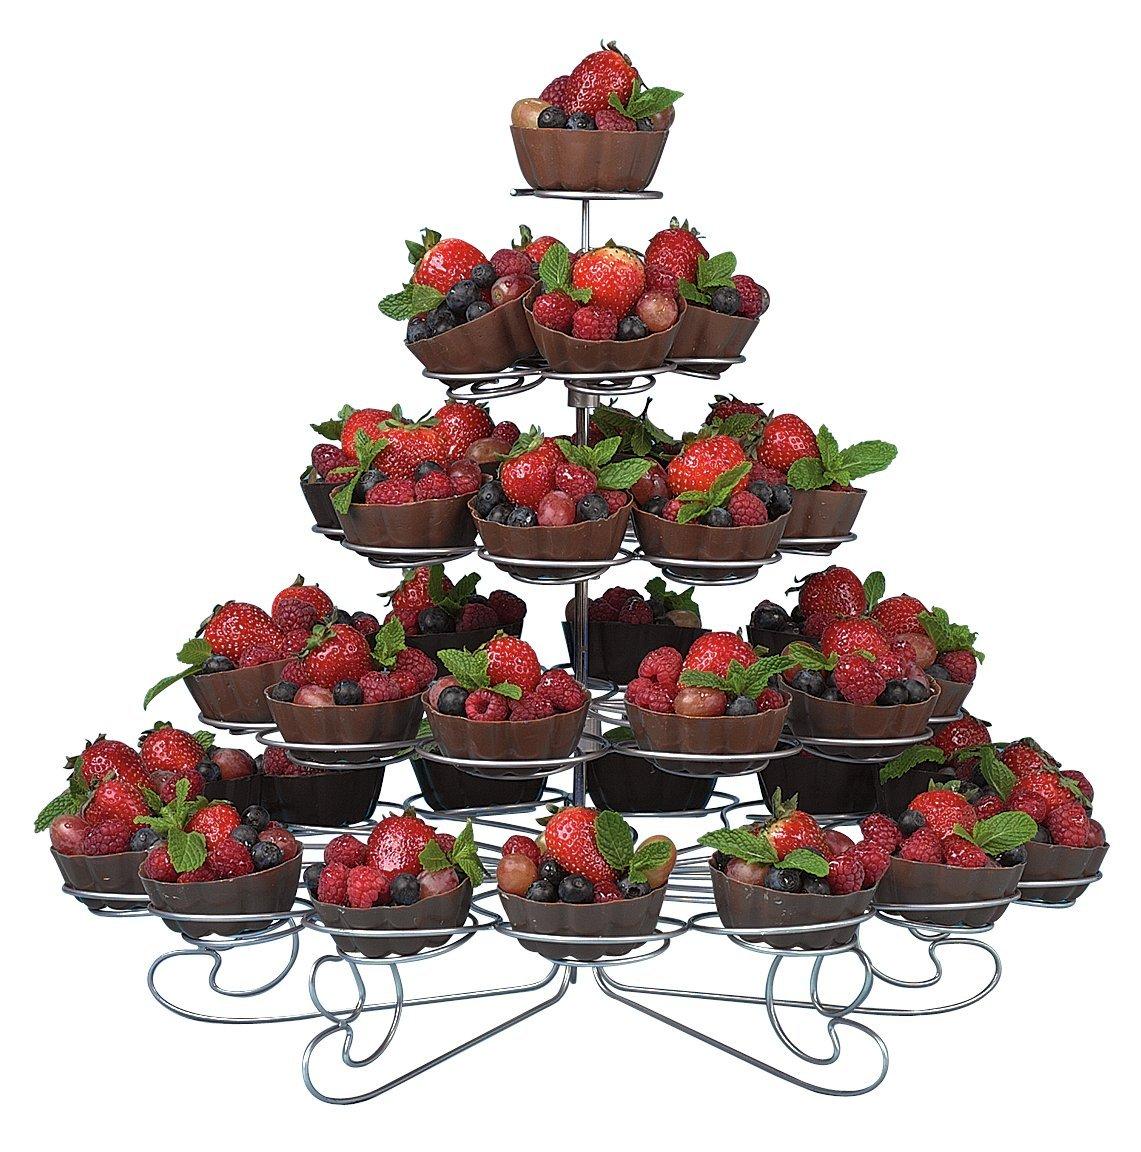 Buy Beautiful Wilton Cupcake Stands